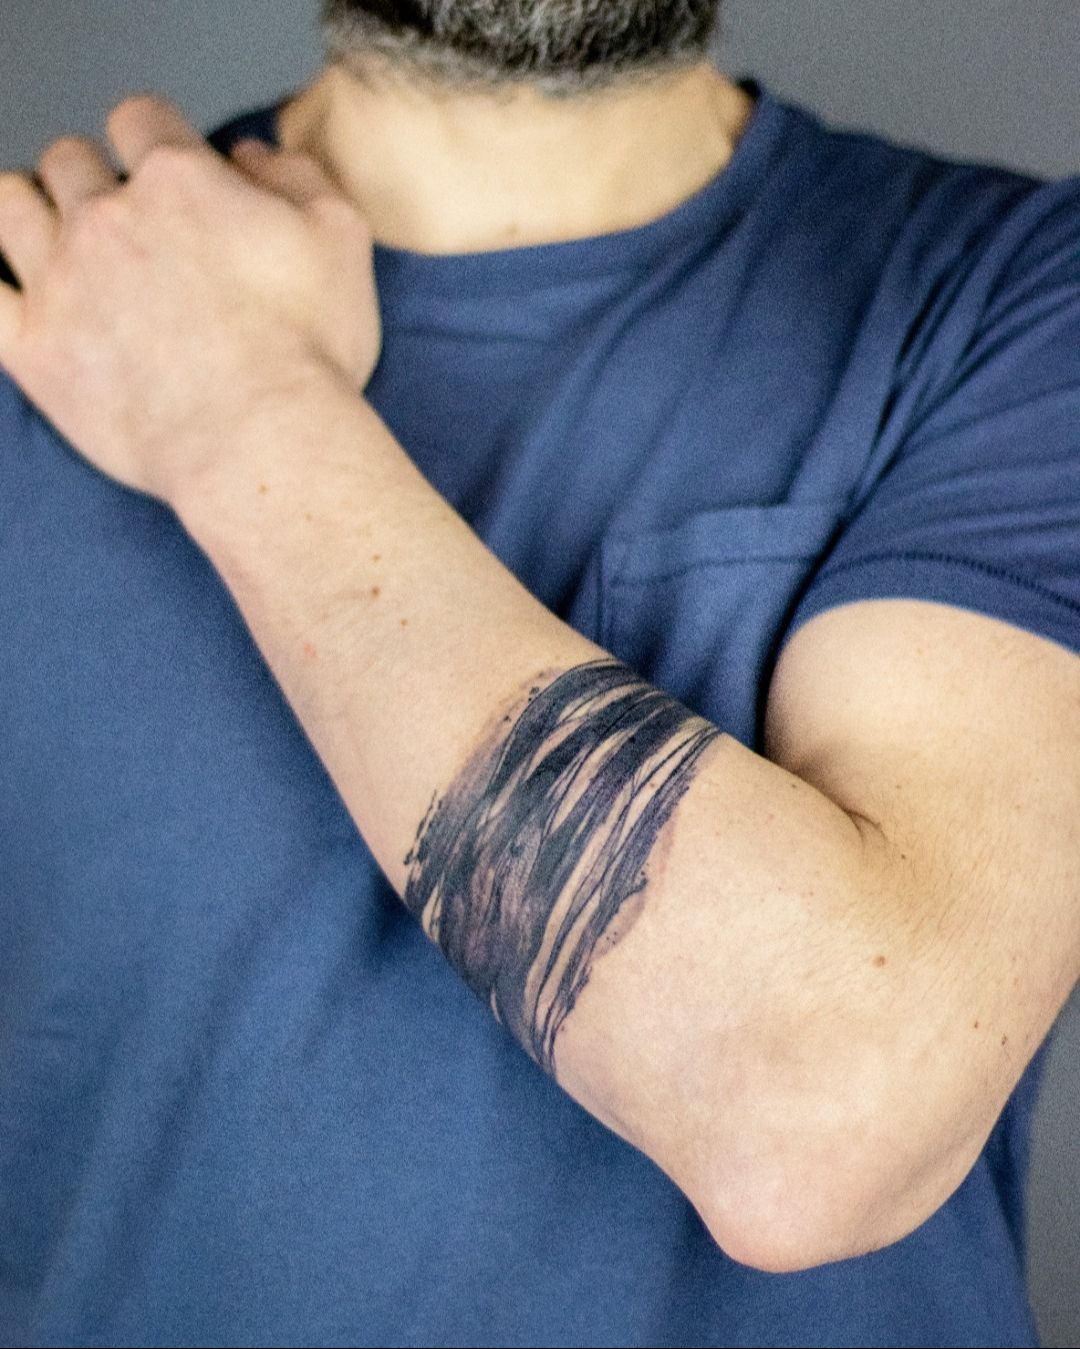 ABSTRACT ARMBAND by @walterdavignon⠀ ⠀ #inklife #inkmaster #inkedmagazine #inkfeature #inkpen #inkaddict #inkedup #inkaddicts #inkedgirls #inkmagazine #inked #inkedgirl #inkmag #bracelettattoo #tattooartist #tattooer #tattooist  #tattoos_of_instagram #tattoolifestyle #tattoo2me #tattooing #tattoostyle #tattooed #tattoolover #tattooideas #tattoosleeve #tattoomagazine #tattoocommunity #tattoomodel #tattooinspiration